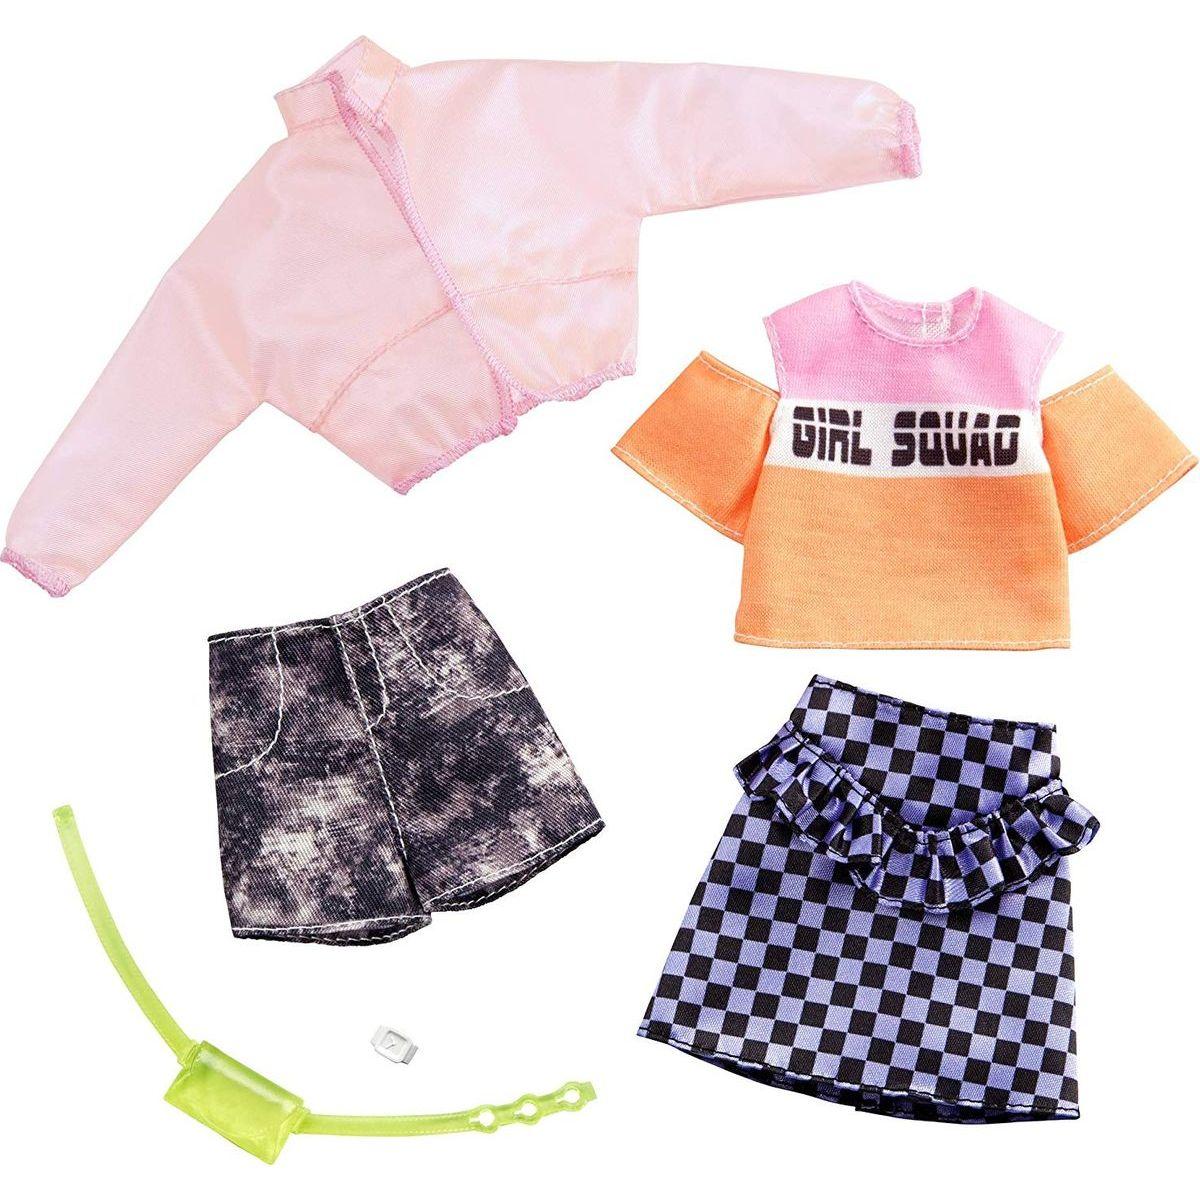 Mattel Barbie Dvojdielny set oblečenie GHX58